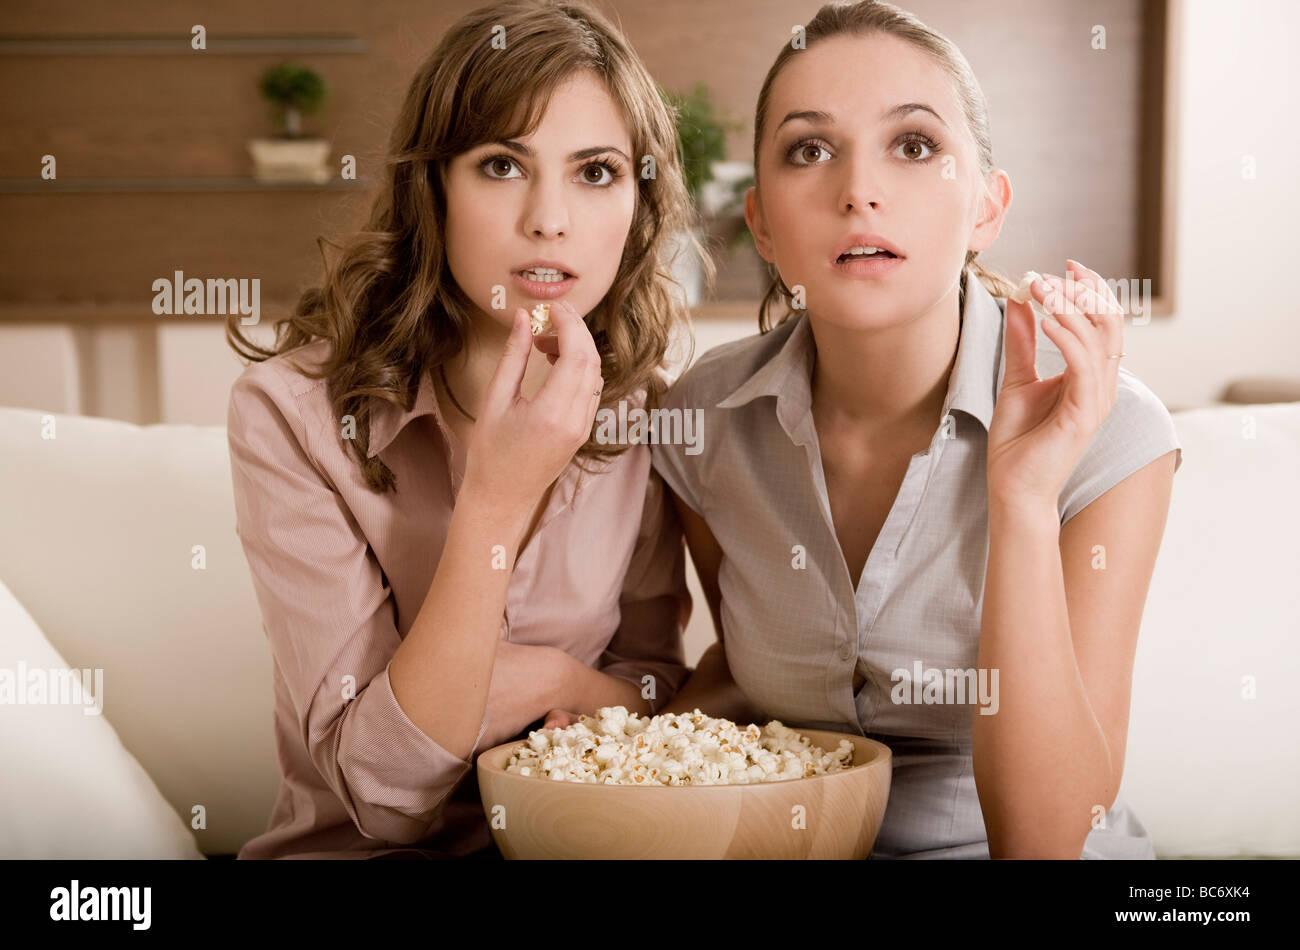 girls watching tv - Stock Image